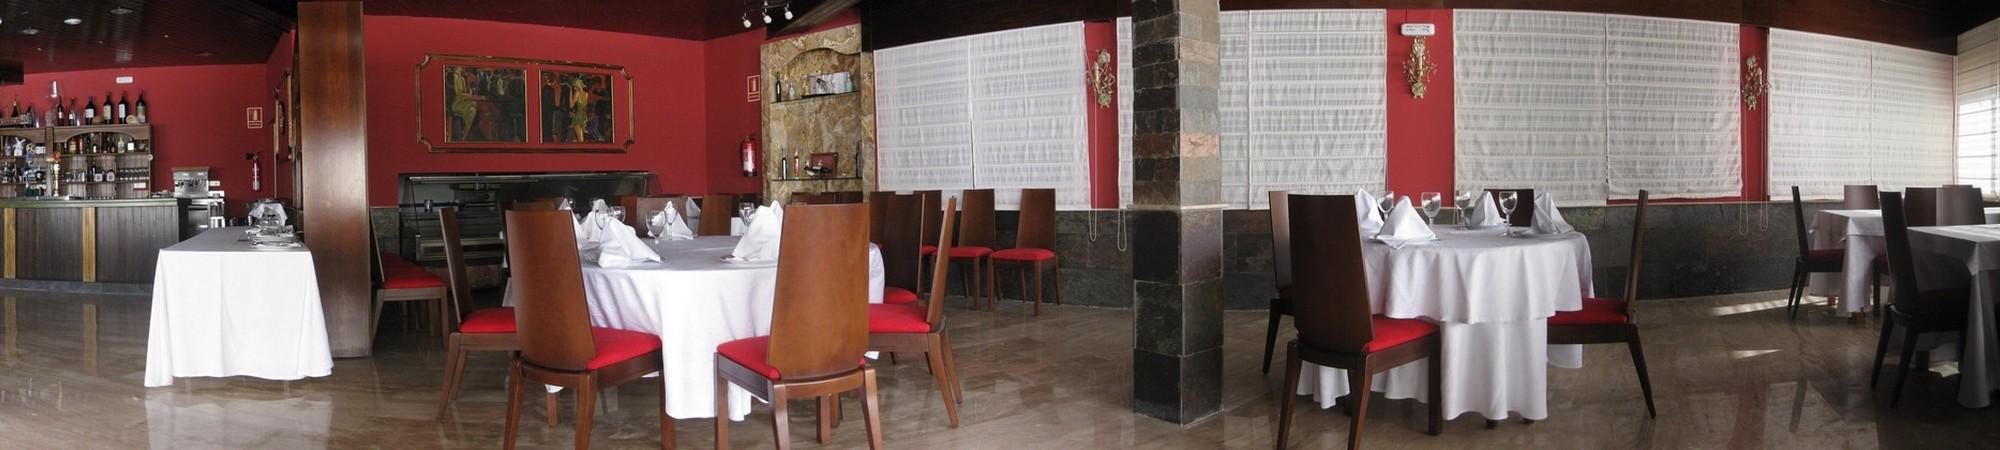 restaurantes en motril, restaurantes motril, restaurantes en salobreña, restaurantes en almuñecar,